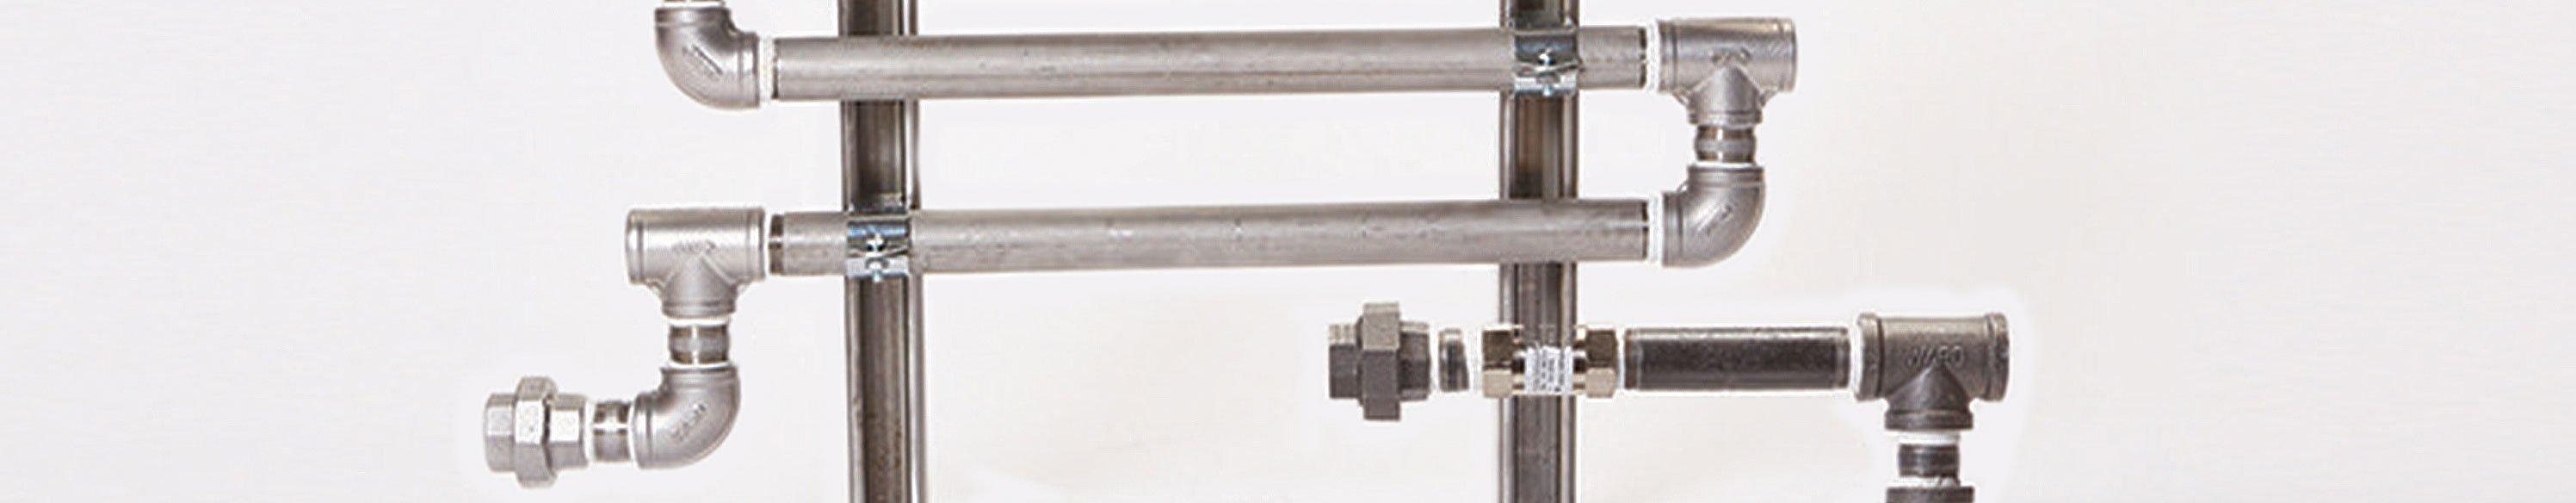 Corrosion Coupon Test Racks